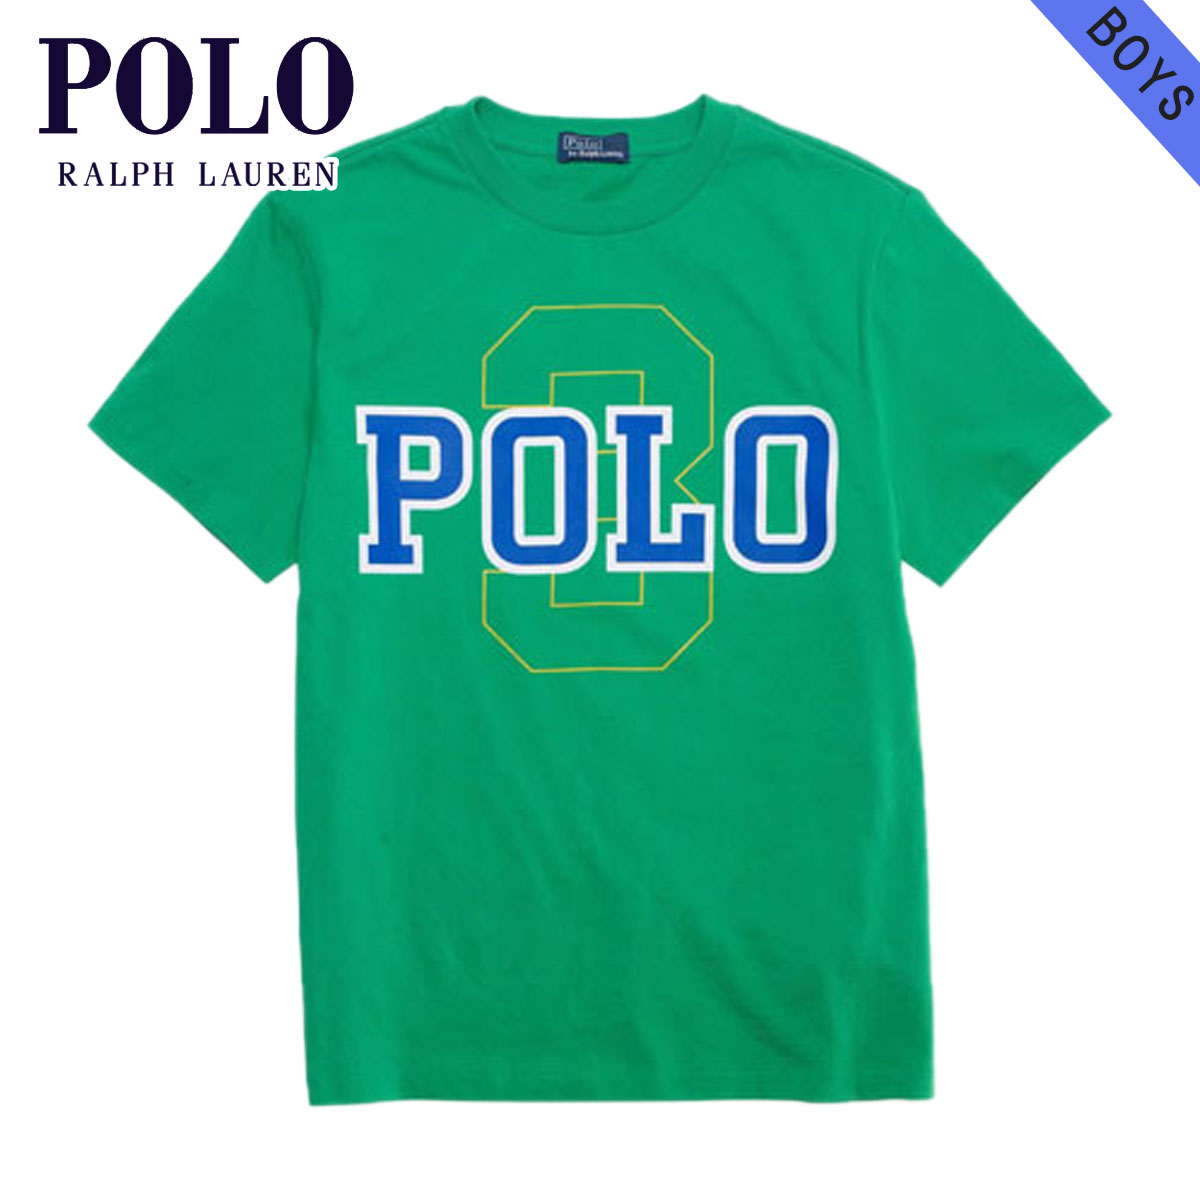 Tシャツ 子供服 POLO RALPH LAUREN CHILDREN 半袖Tシャツ ラルフローレン ポロ 正規品 #33021536 D20S30 Polo Cotton Tee キッズ